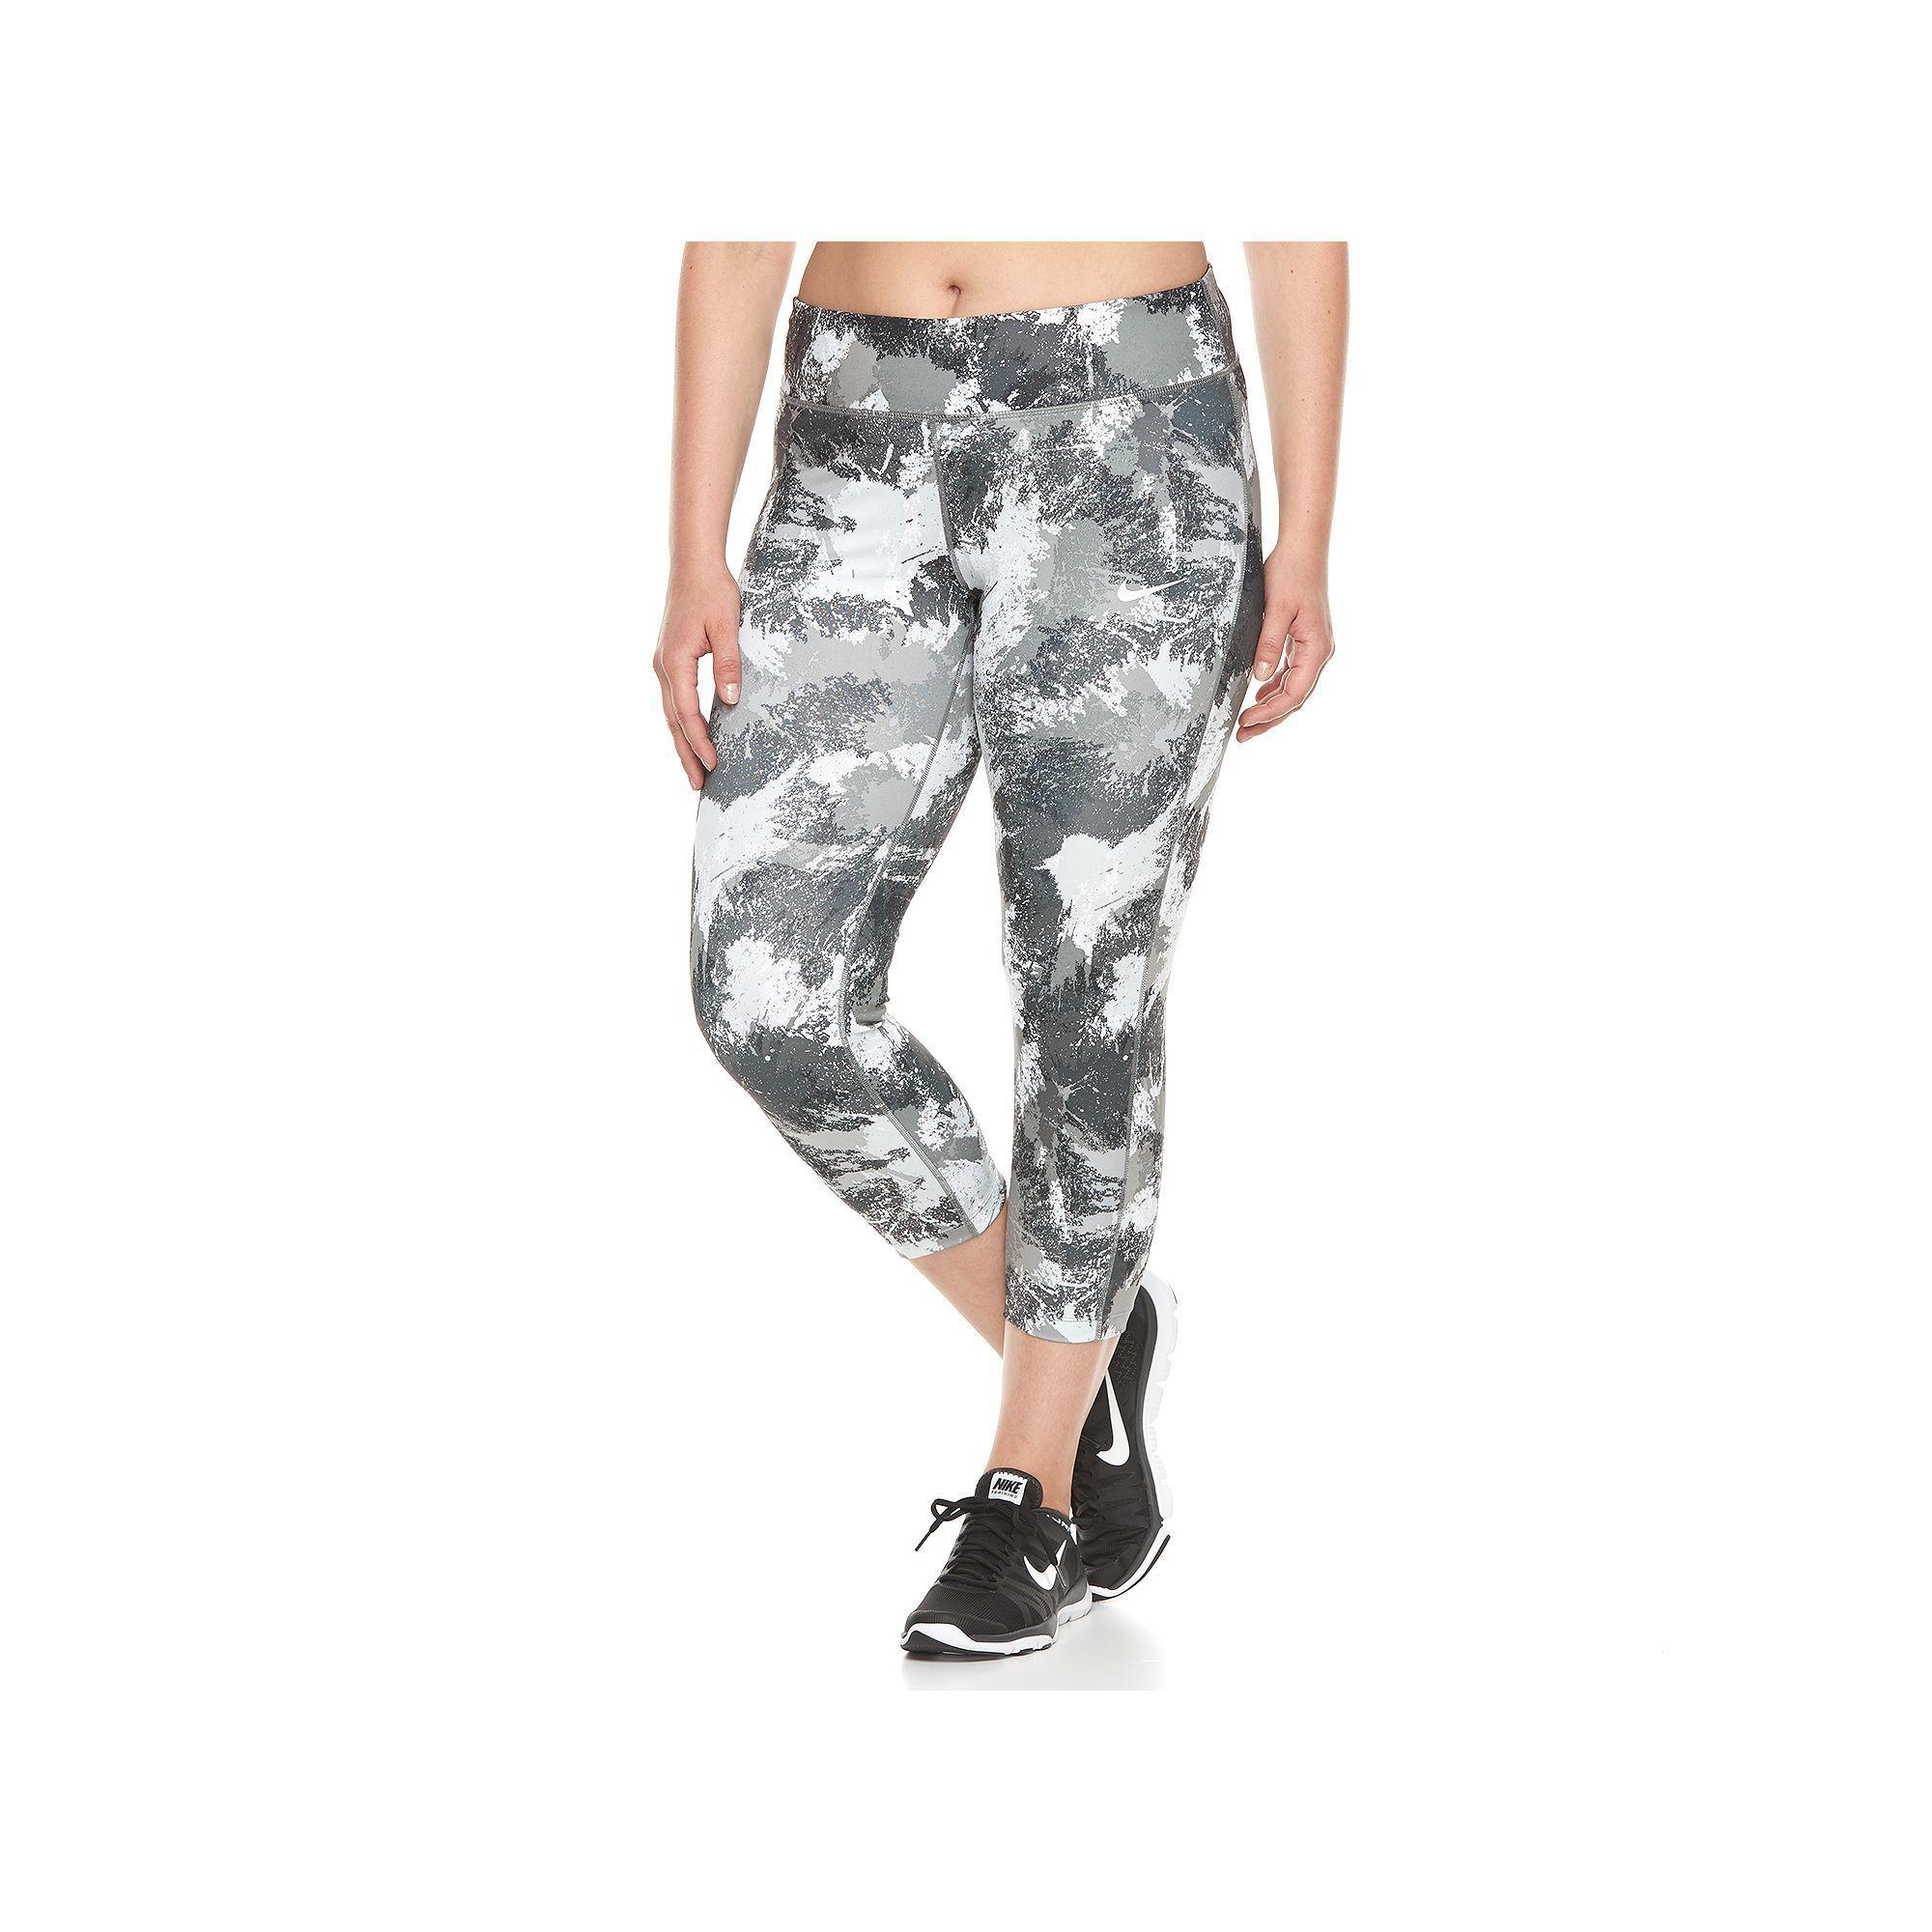 524452156a0 Plus Size Nike Essential Running Crop Leggings